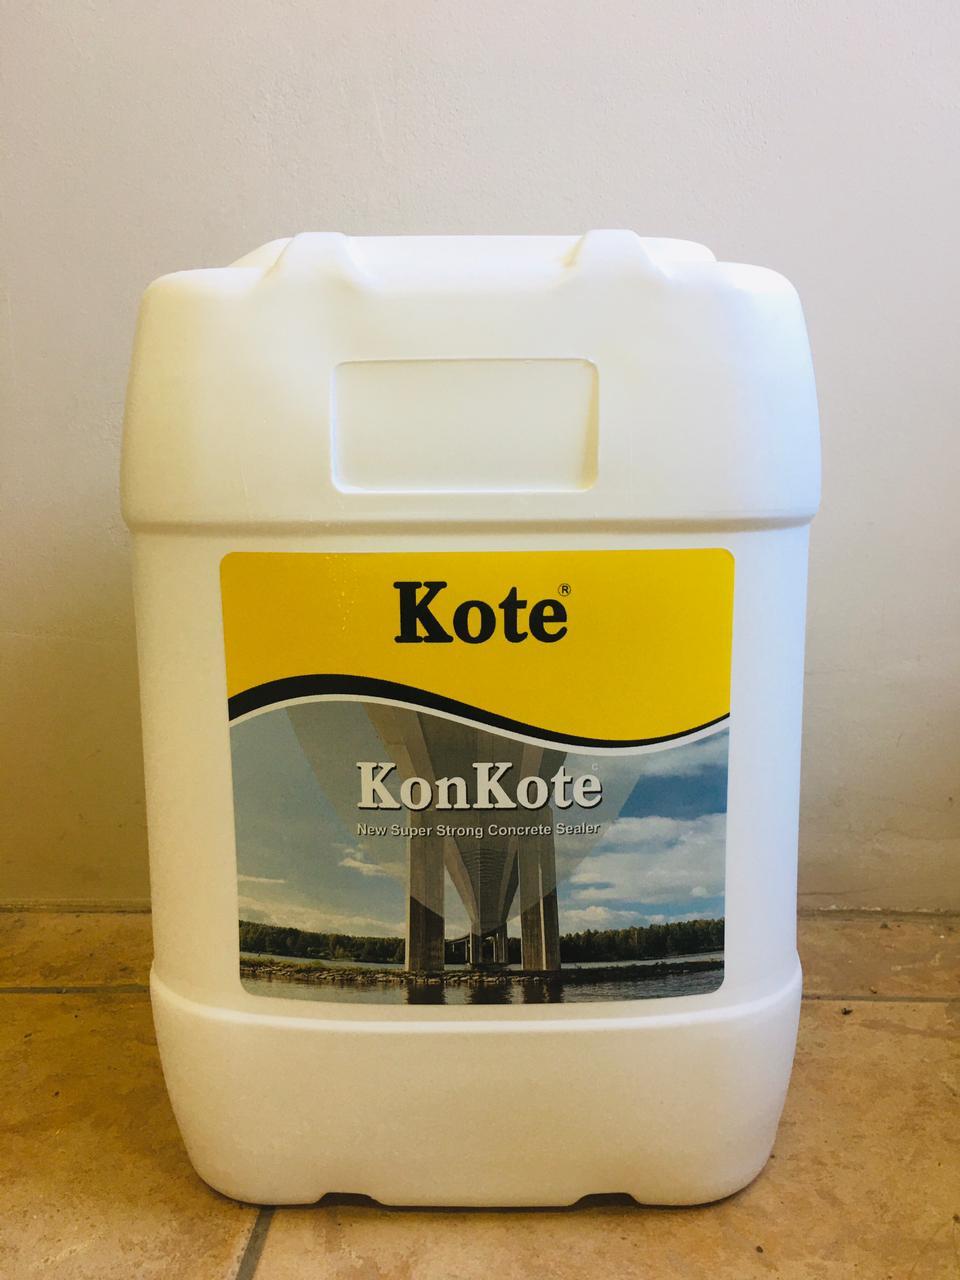 KonKote - Concrete Sealer - Durban - South Africa